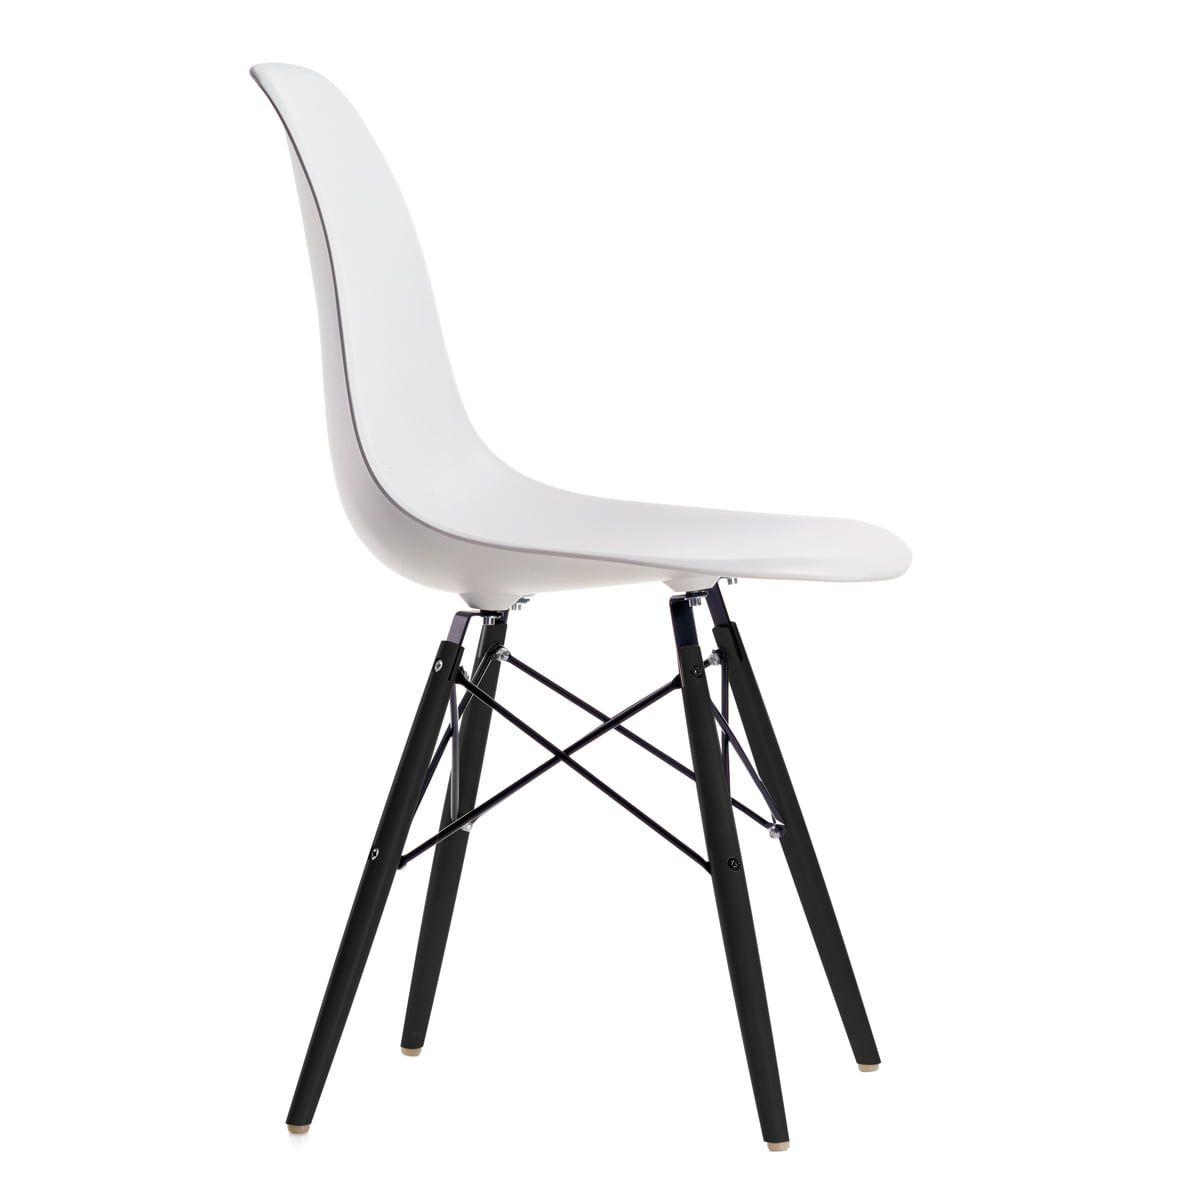 Vitra Eames Plastic Side Chair DSW, Ahorn schwarz / weiß